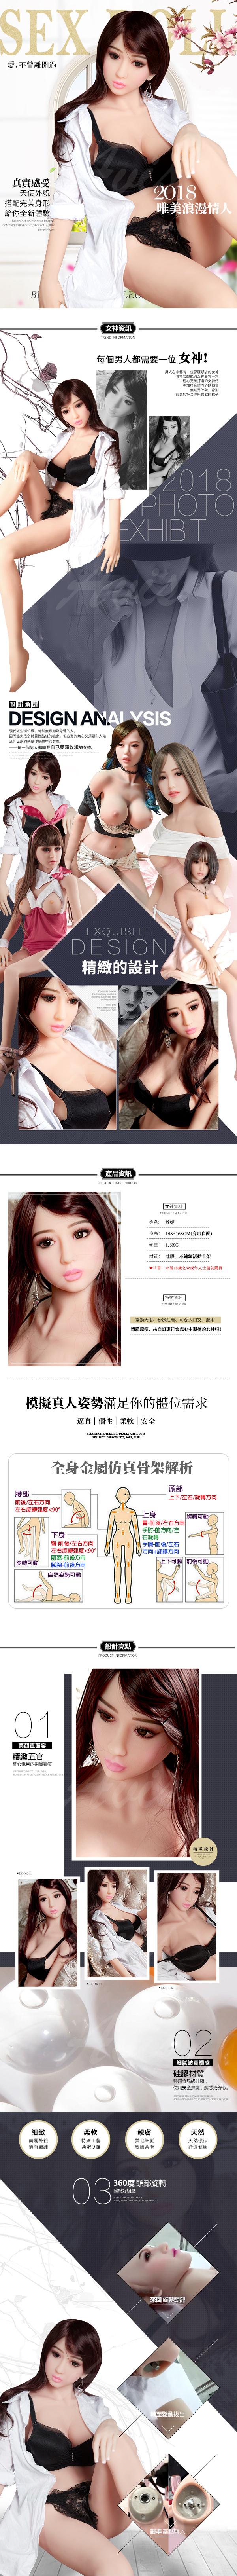 JENNY珍妮 真人版矽膠娃娃頭 青春少女 可安裝148~168cm 身體